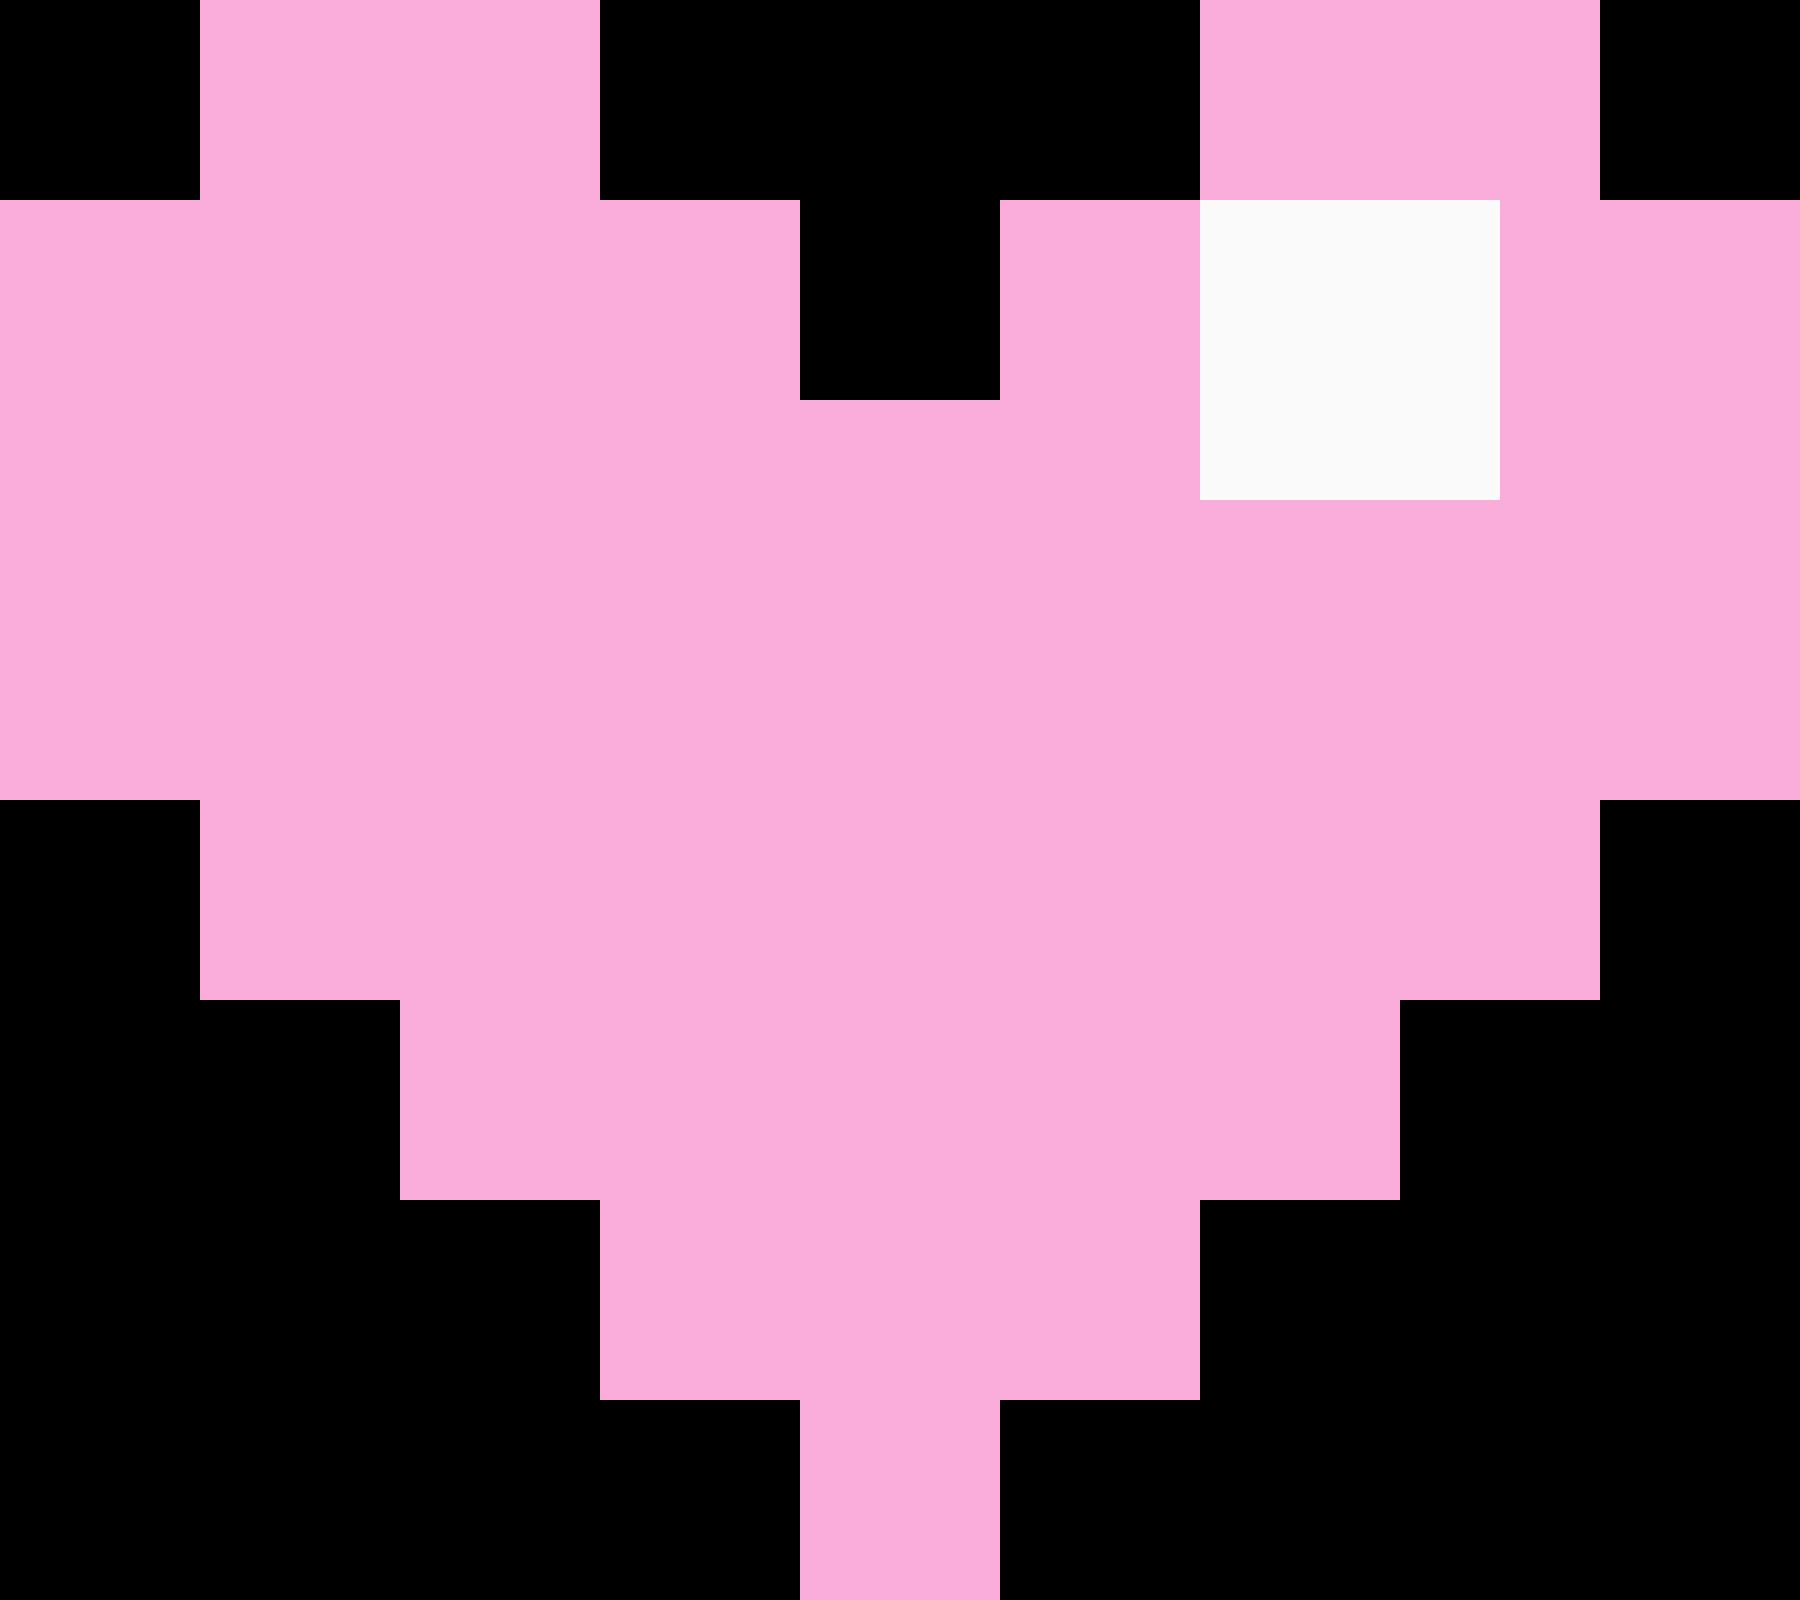 pinky heart   Pixel Art Maker